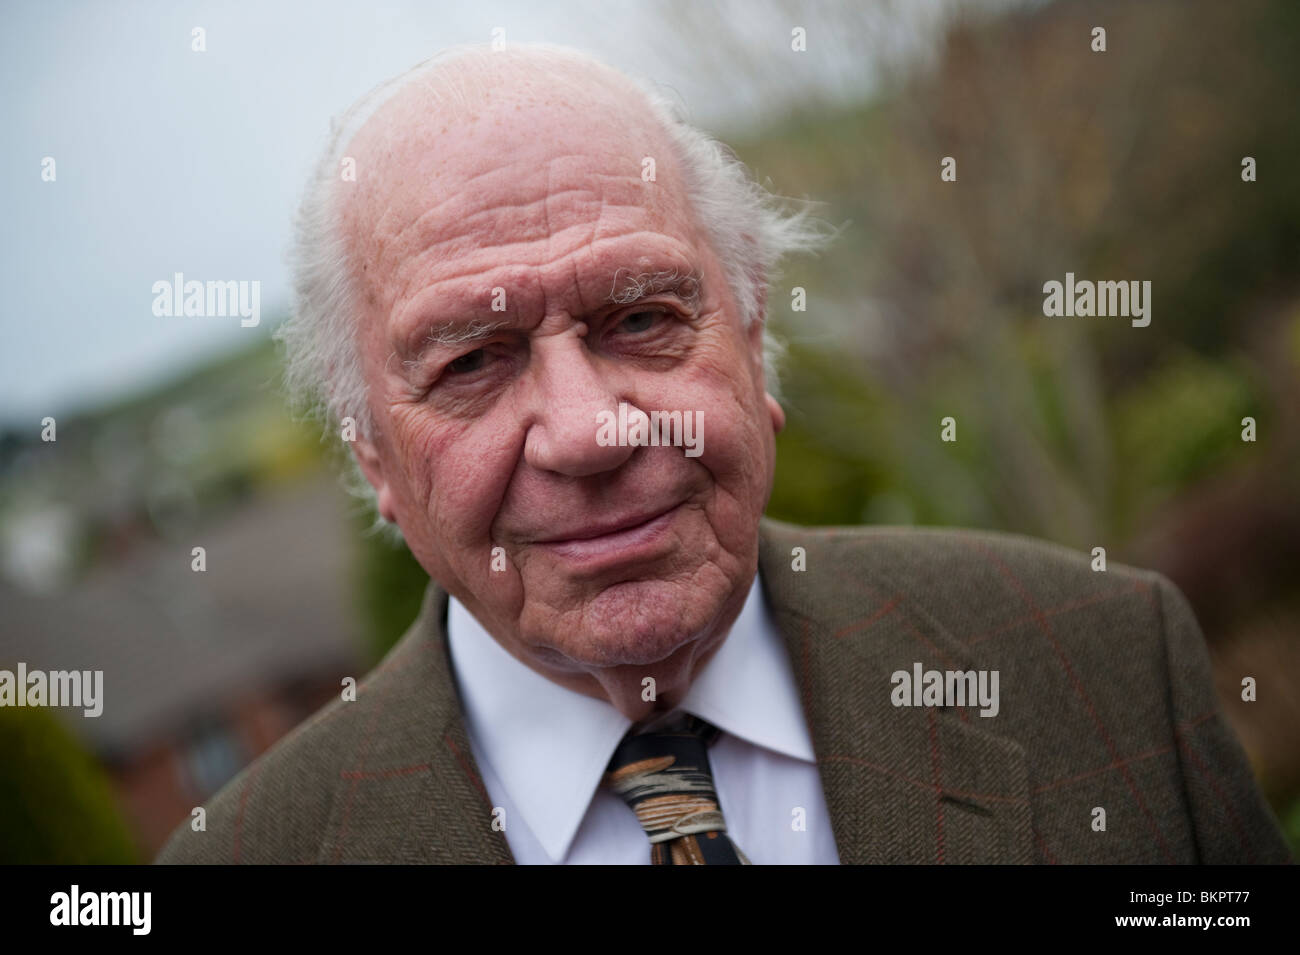 Harold Carter, emeritus professor of human geography, University of Wales , UK - Stock Image